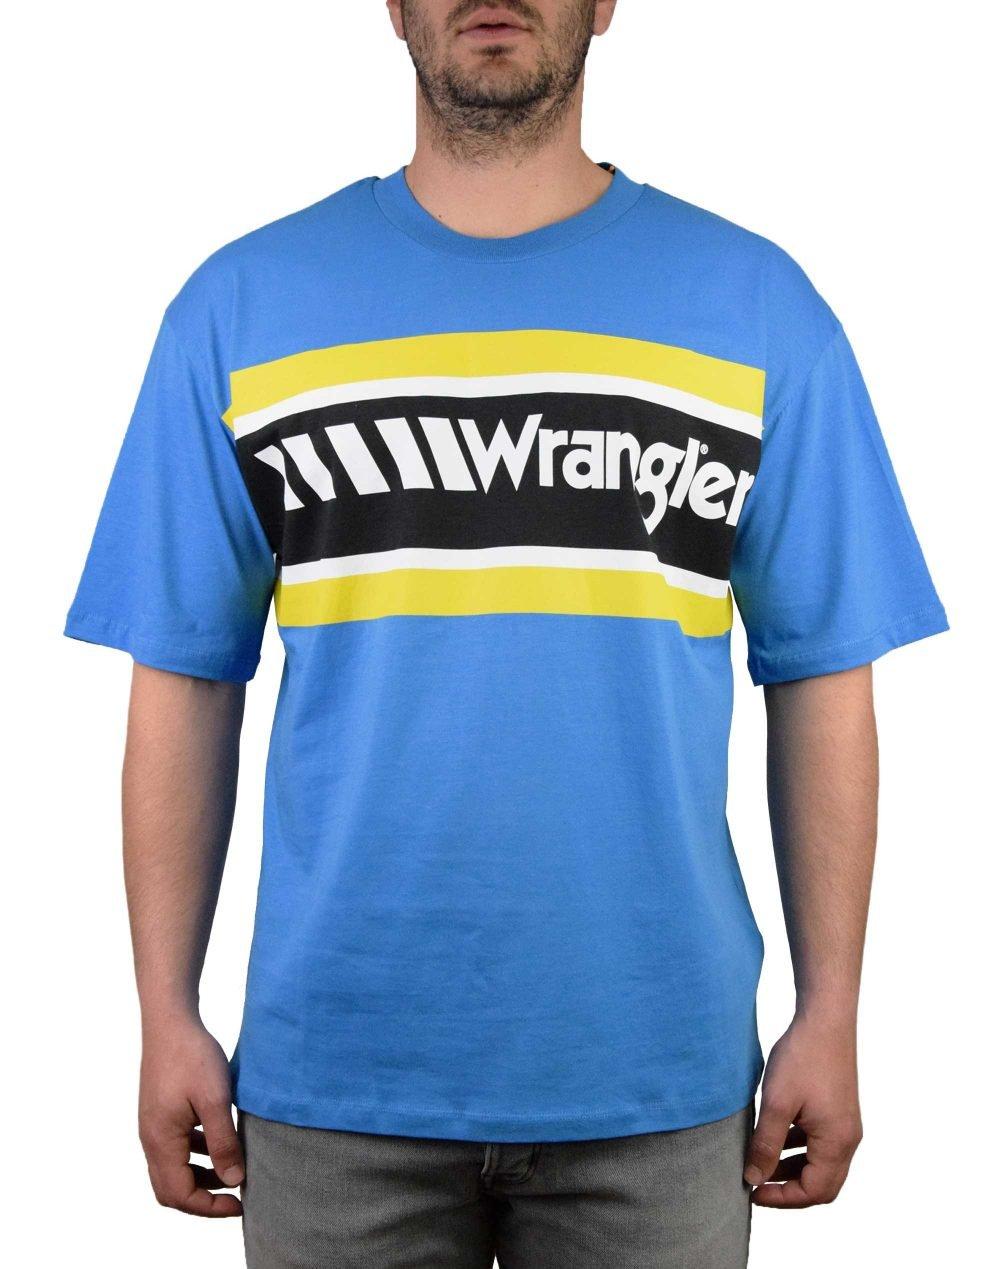 Wrangler B&Y Oversized Tee (W7C44GHBR) Mediterranean Blue